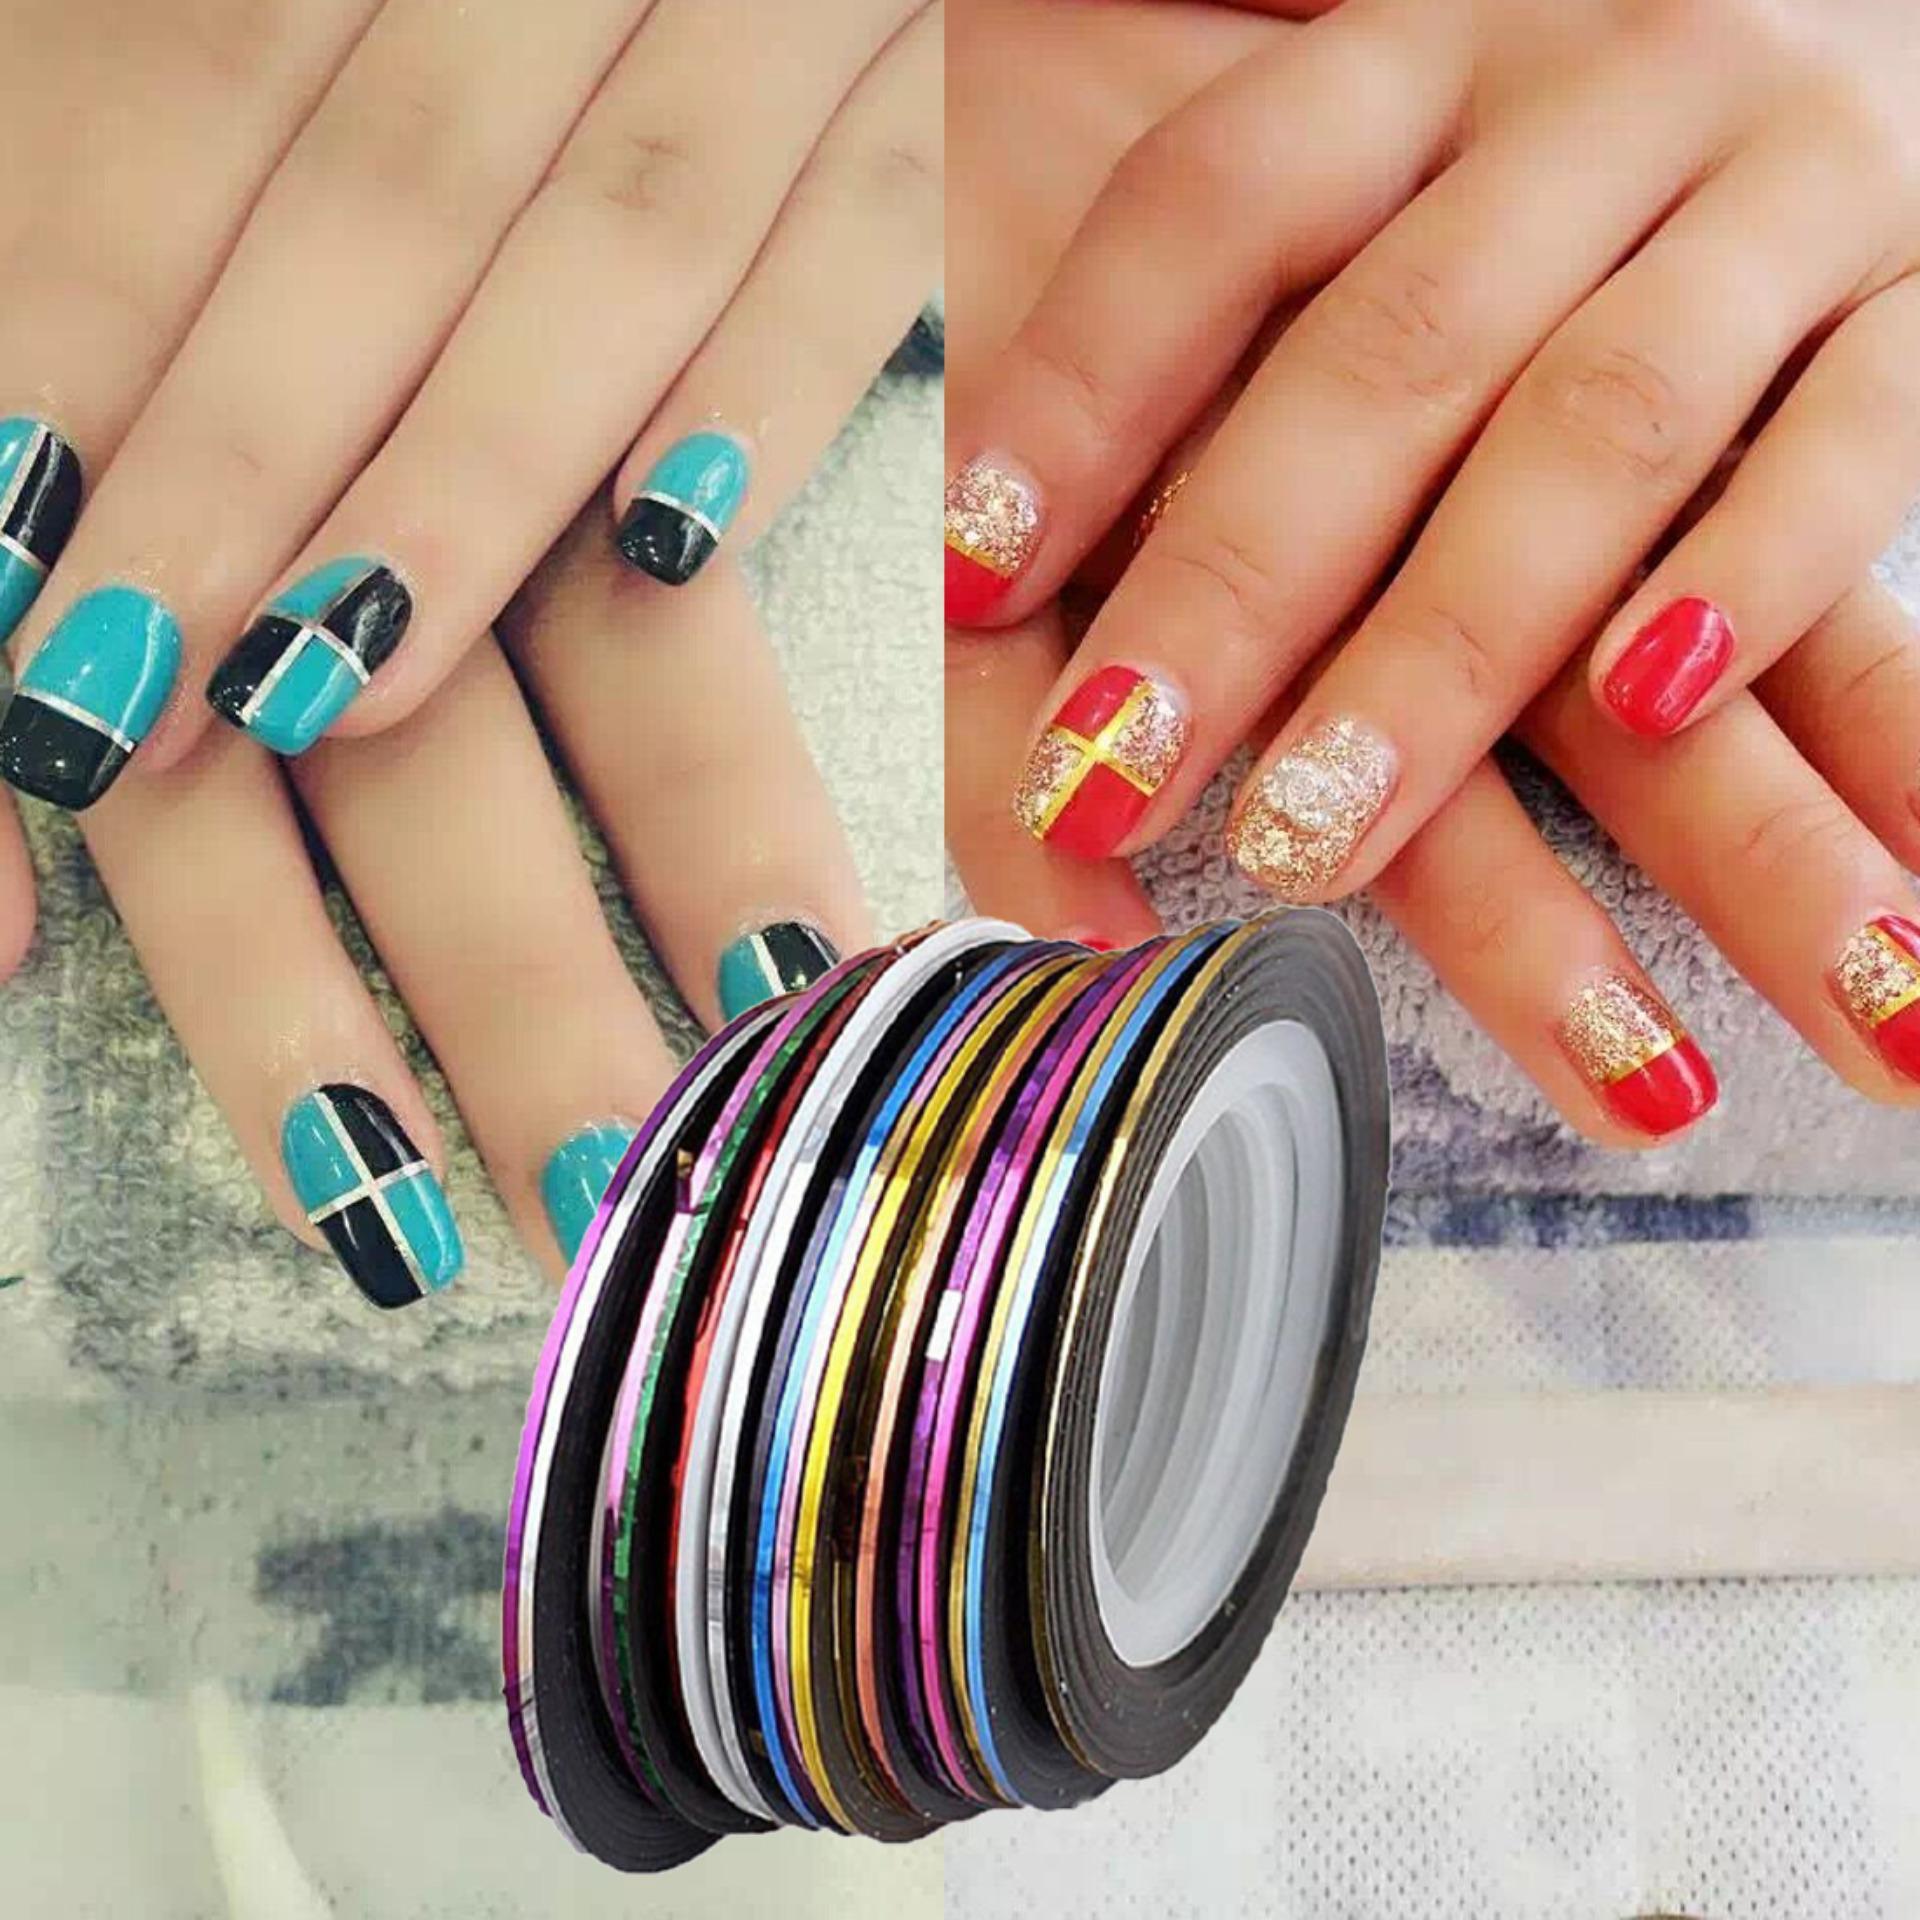 Decoration 10Pcs/Set Colors Striping Tape Line Diy Nail Art  Sticker Manicure (Intl) Philippines